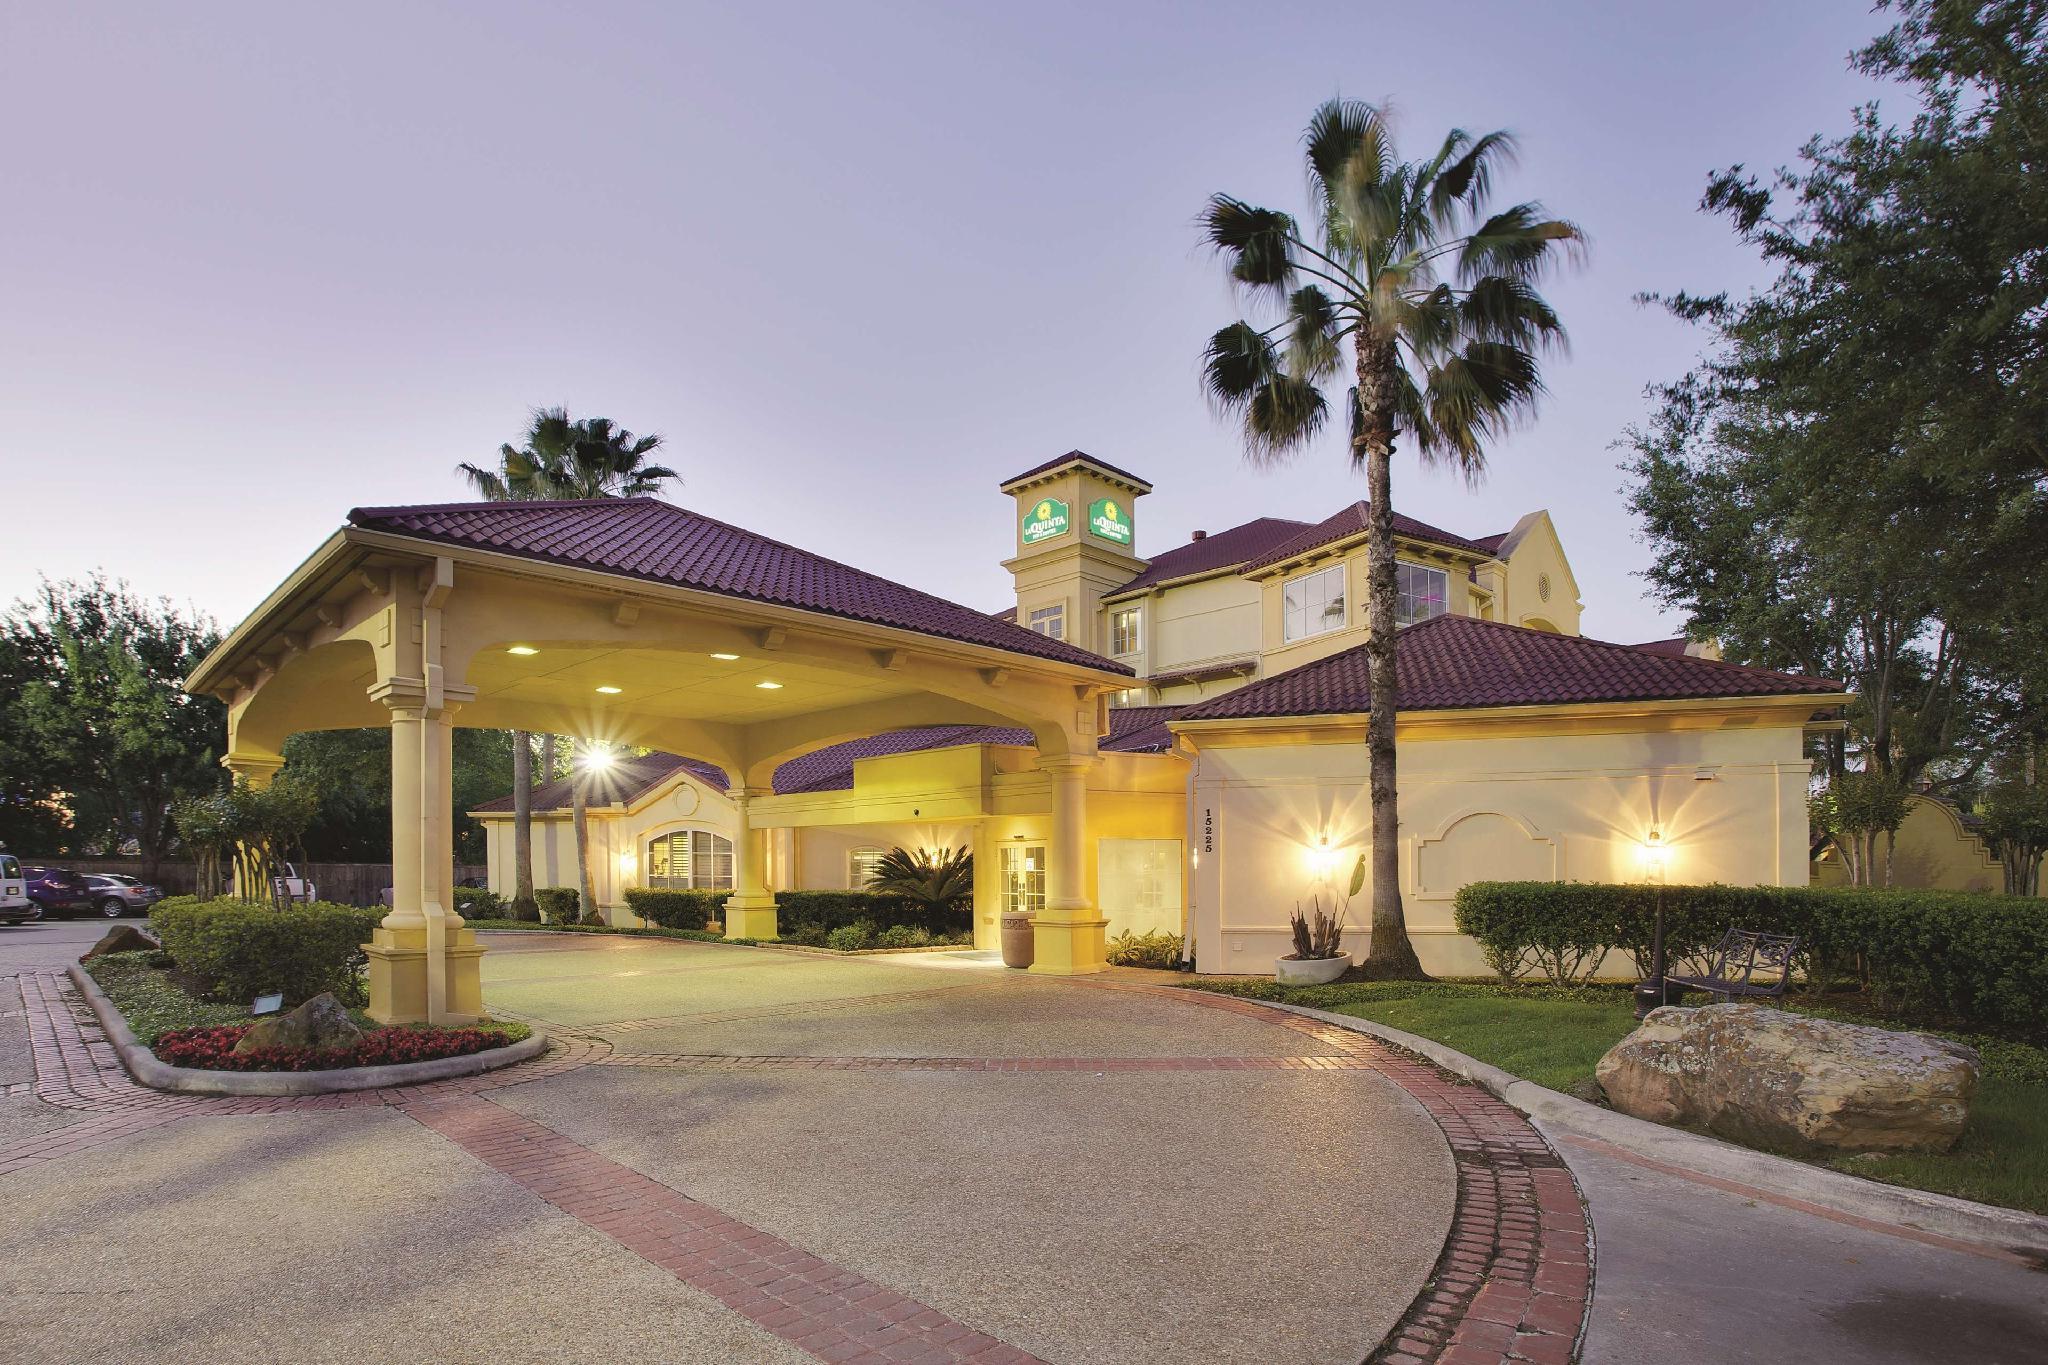 La Quinta Inn And Suites By Wyndham Houston West Park 10